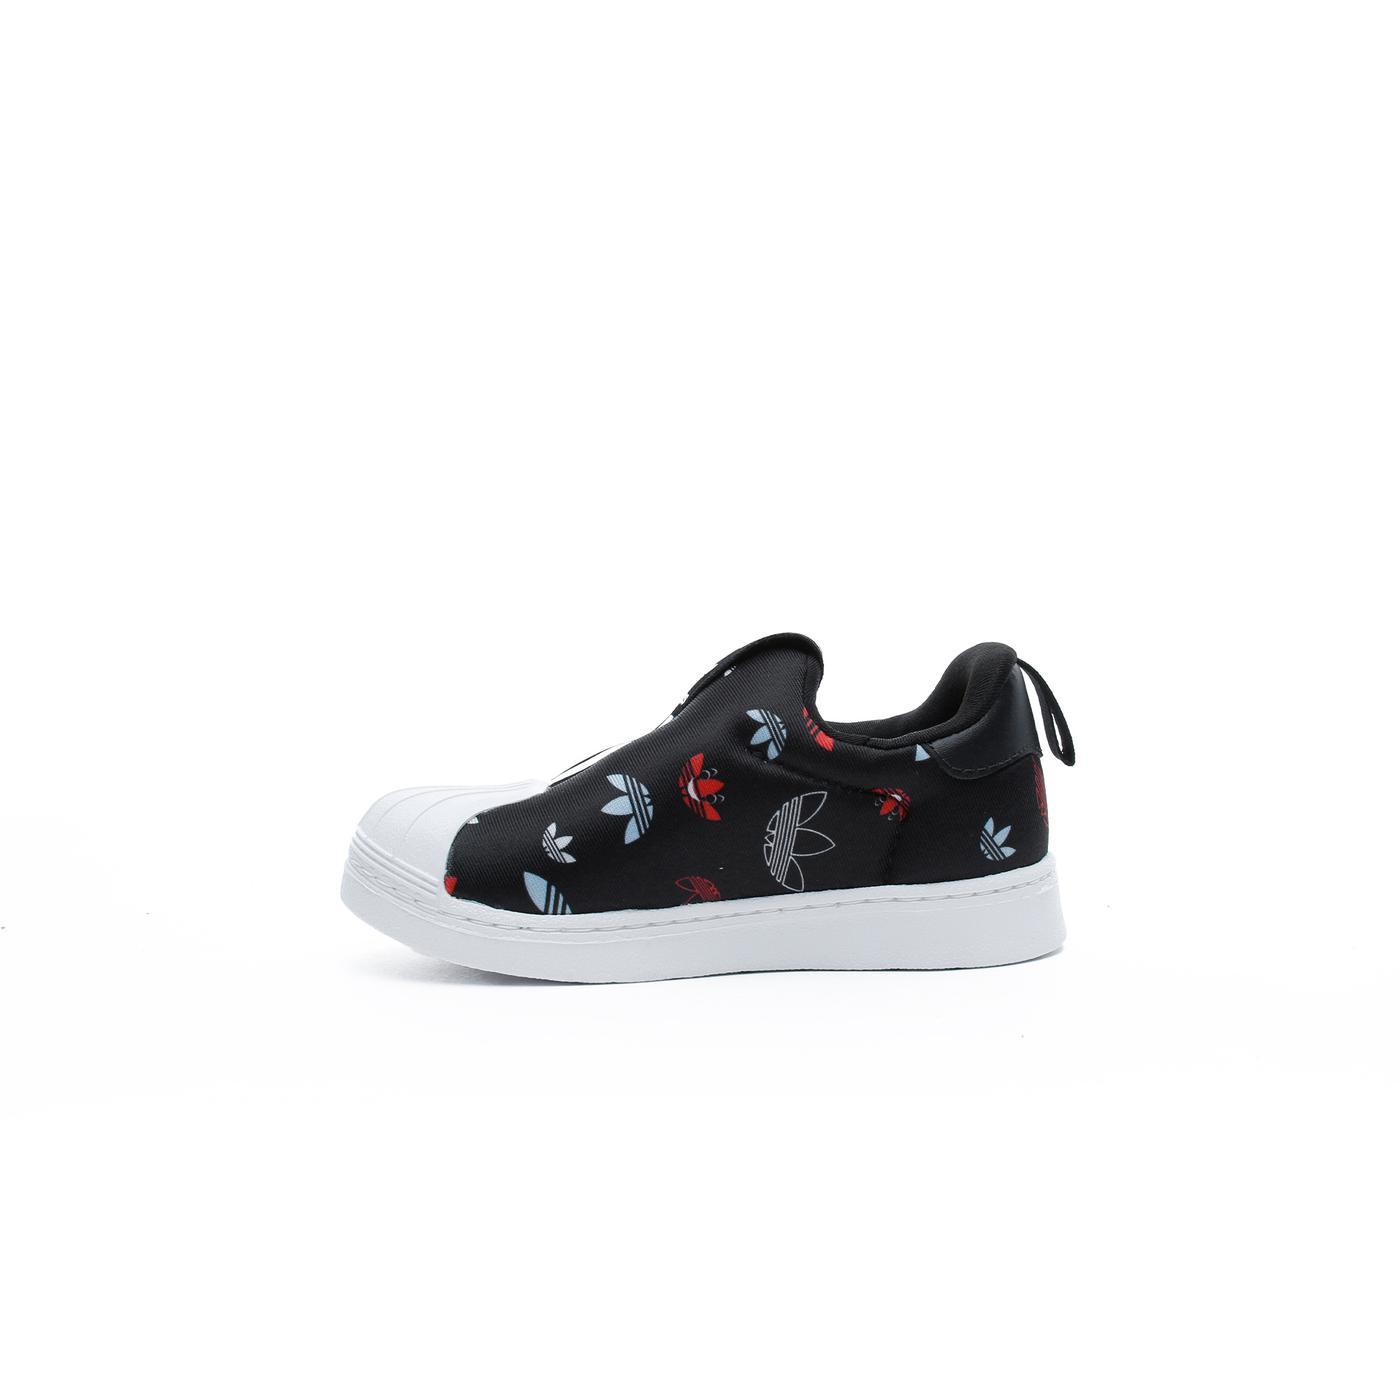 adidas Superstar 360 X Bebek Siyah Spor Ayakkabı